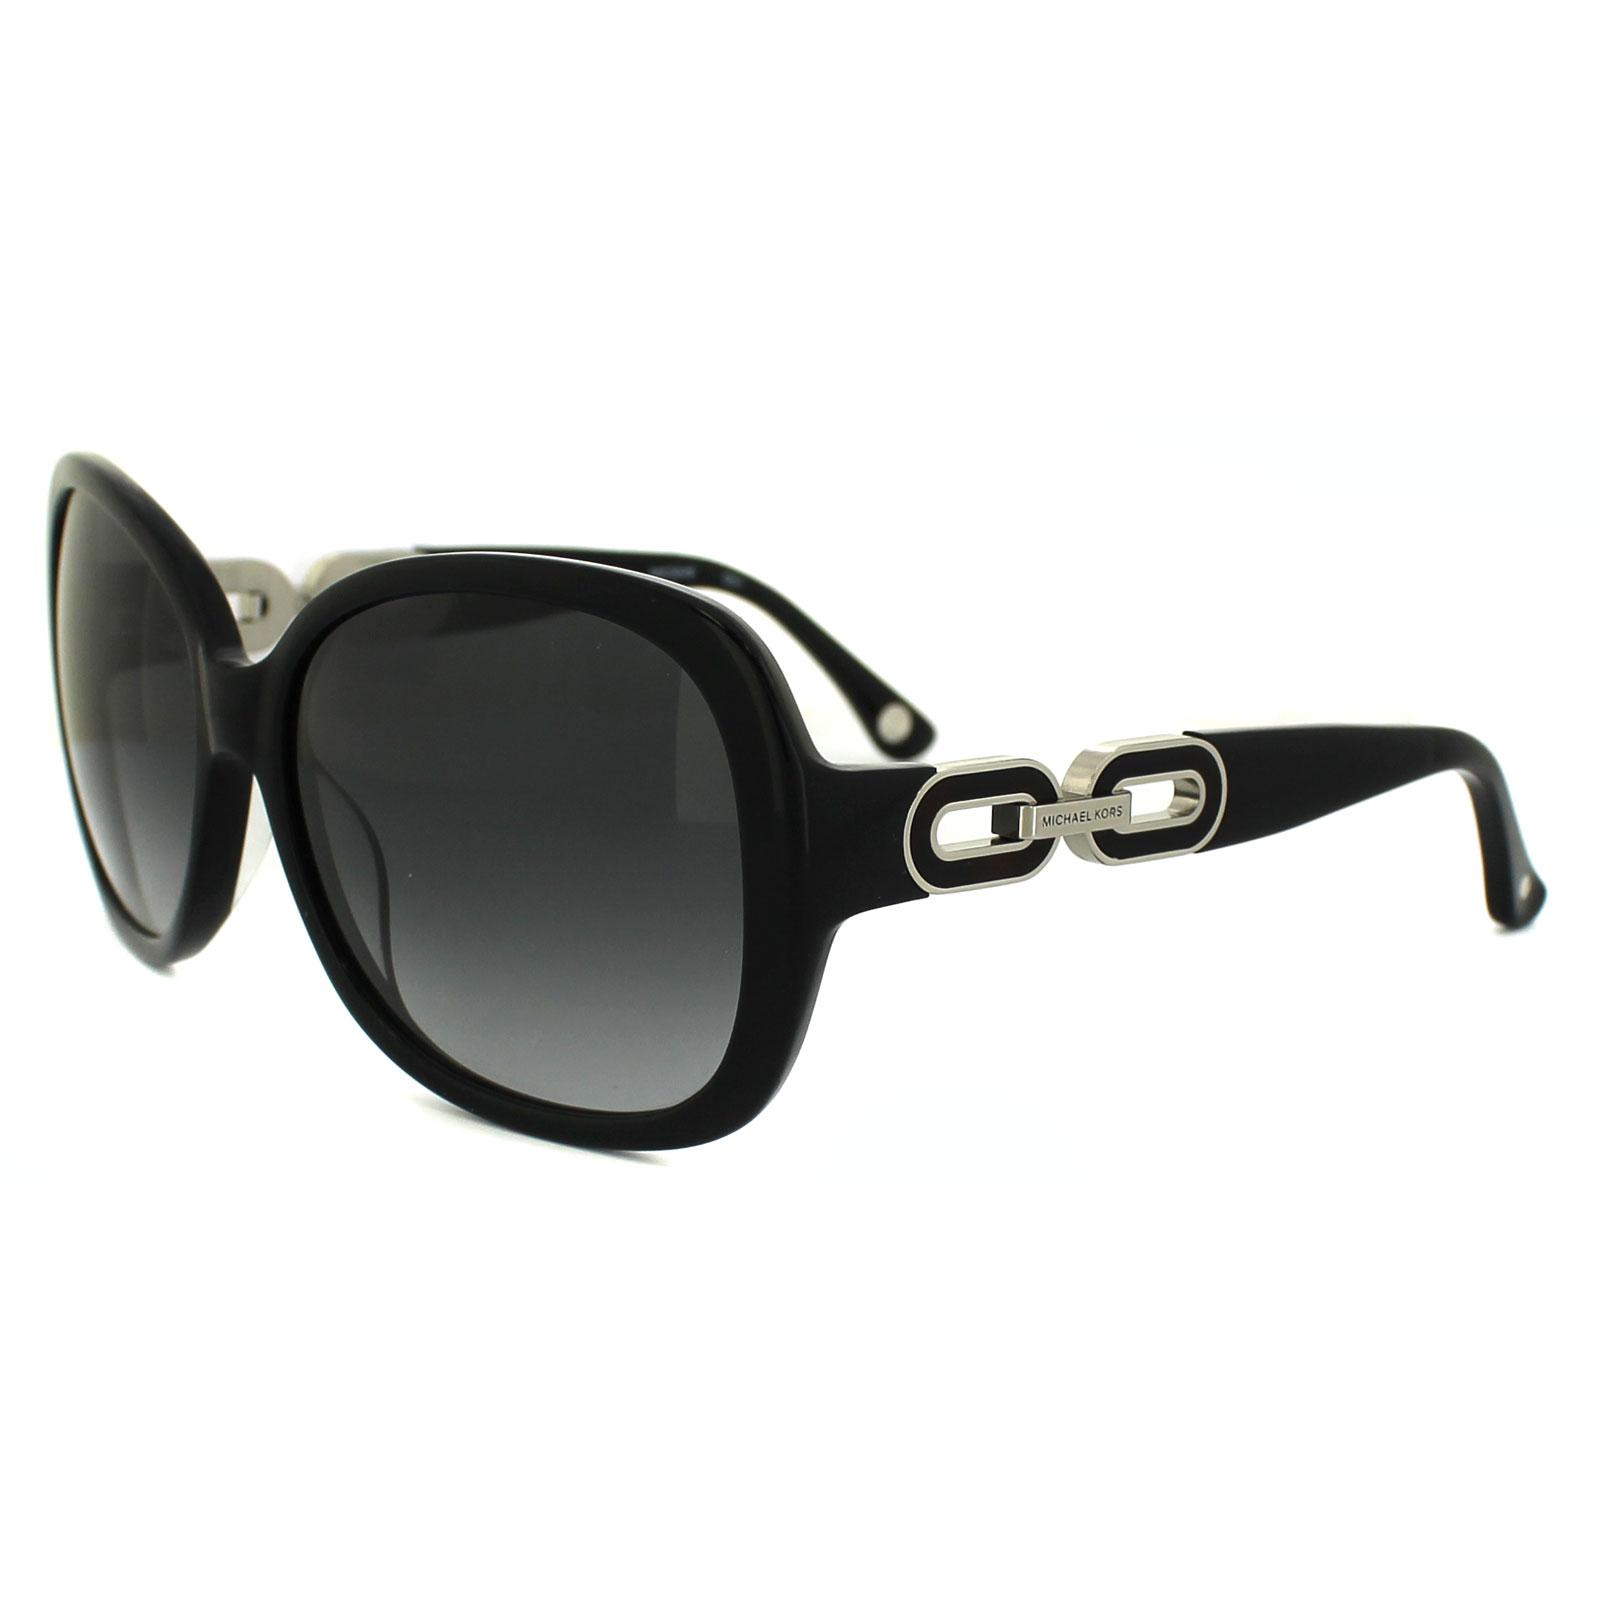 e732612022 Cheap Michael Kors Anna MKS846 Sunglasses - Discounted Sunglasses